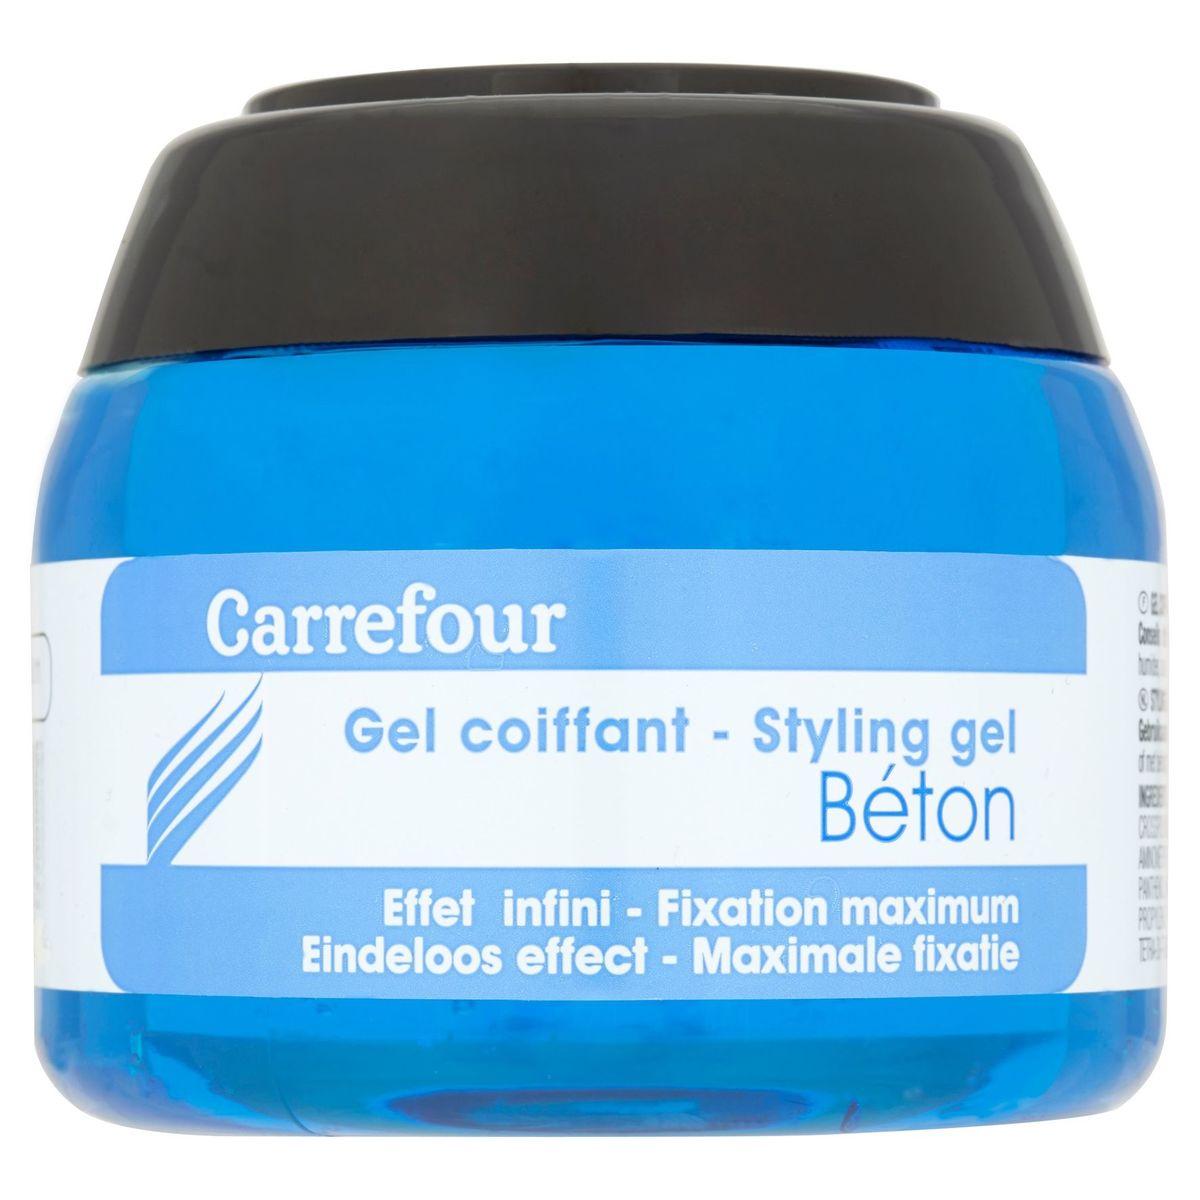 Carrefour Gel Coiffant béton 250 ml